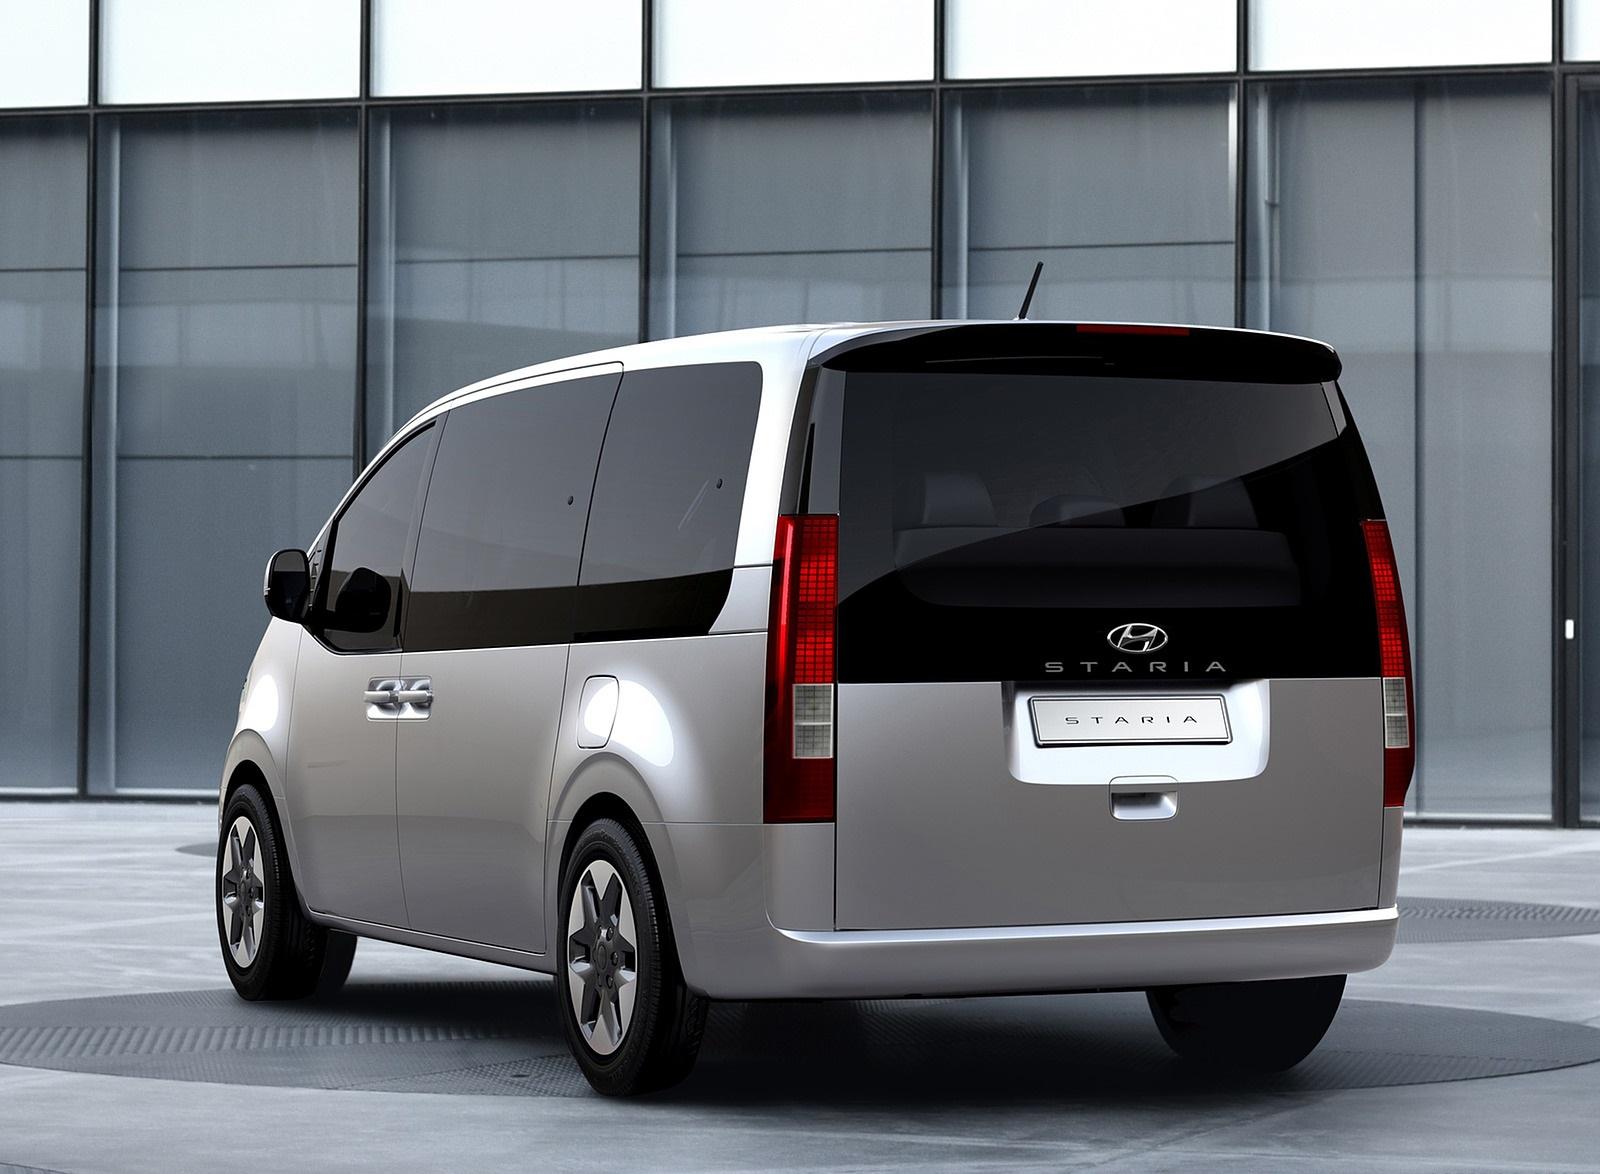 2022 Hyundai Staria Rear Wallpapers (2)